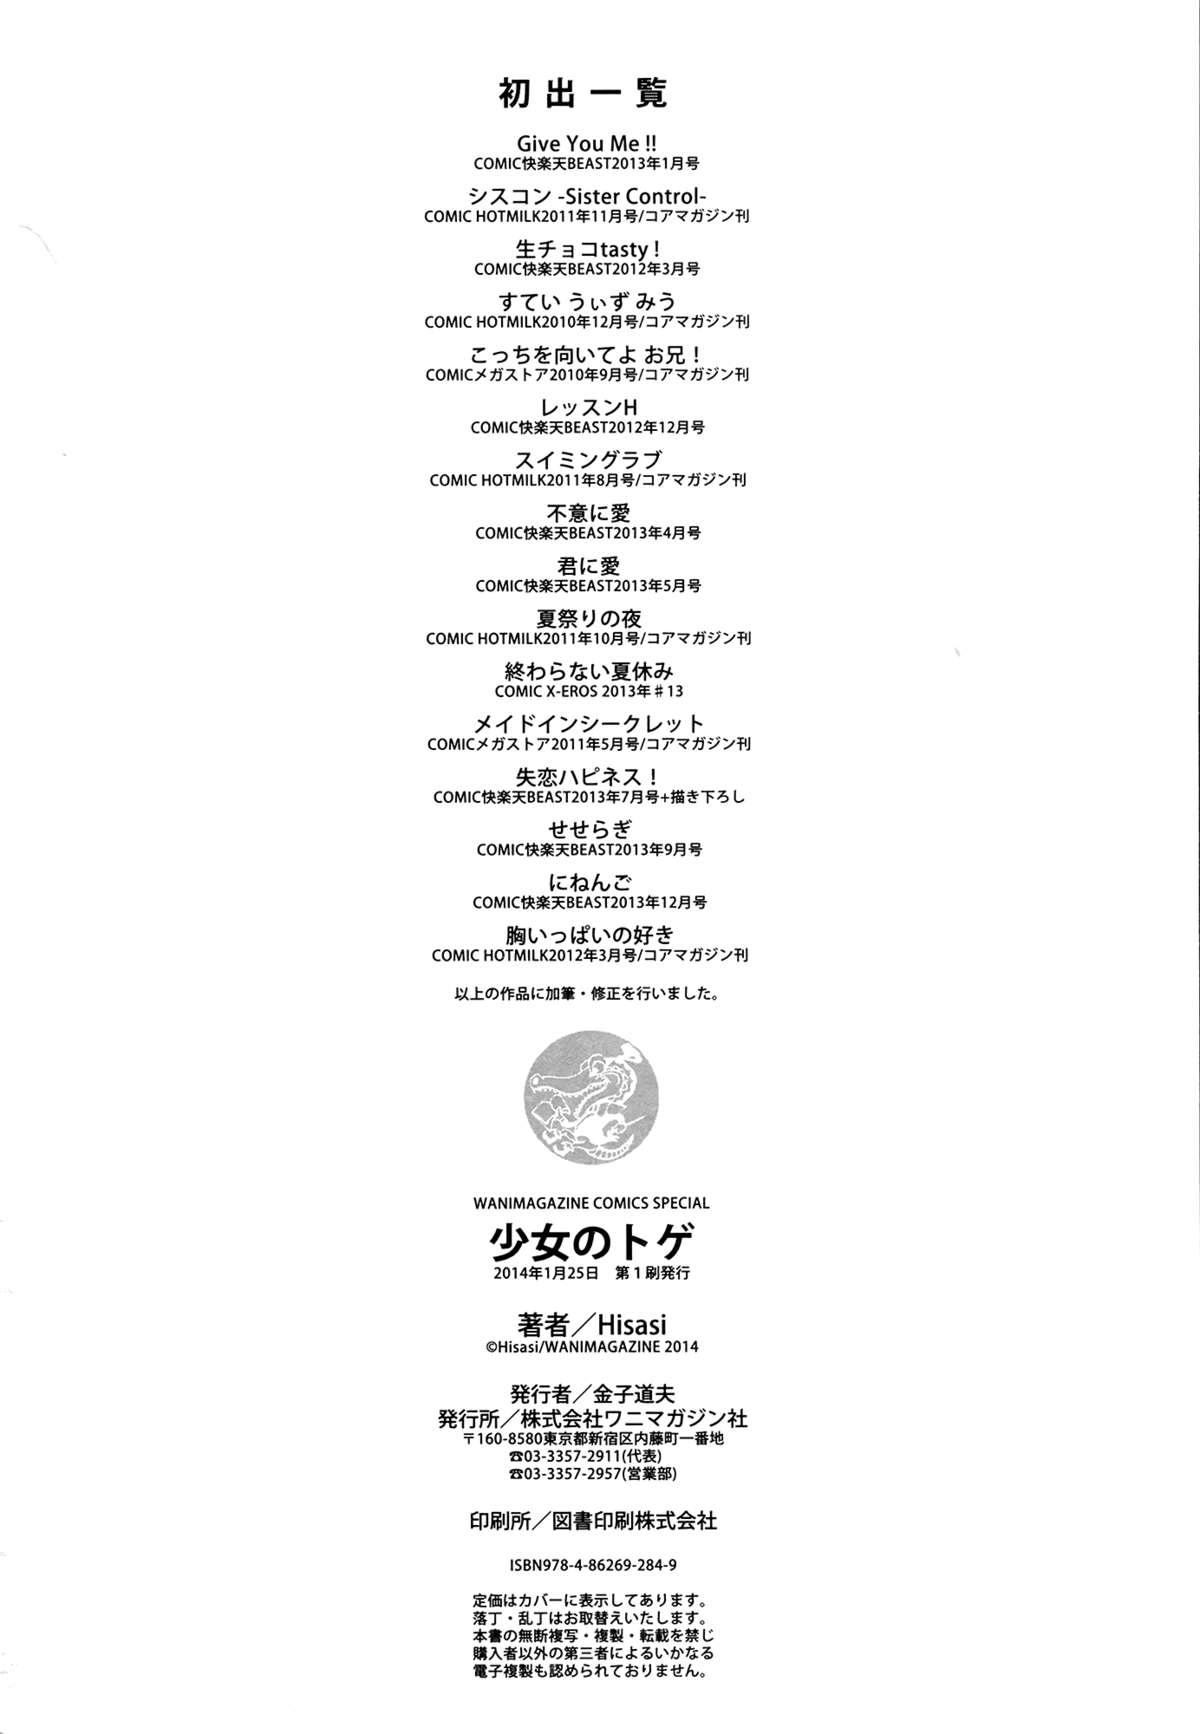 [Hisasi] Shoujo no Toge ~No girl without a thorn~ [English][Digital] + 8P Shousasshi 210